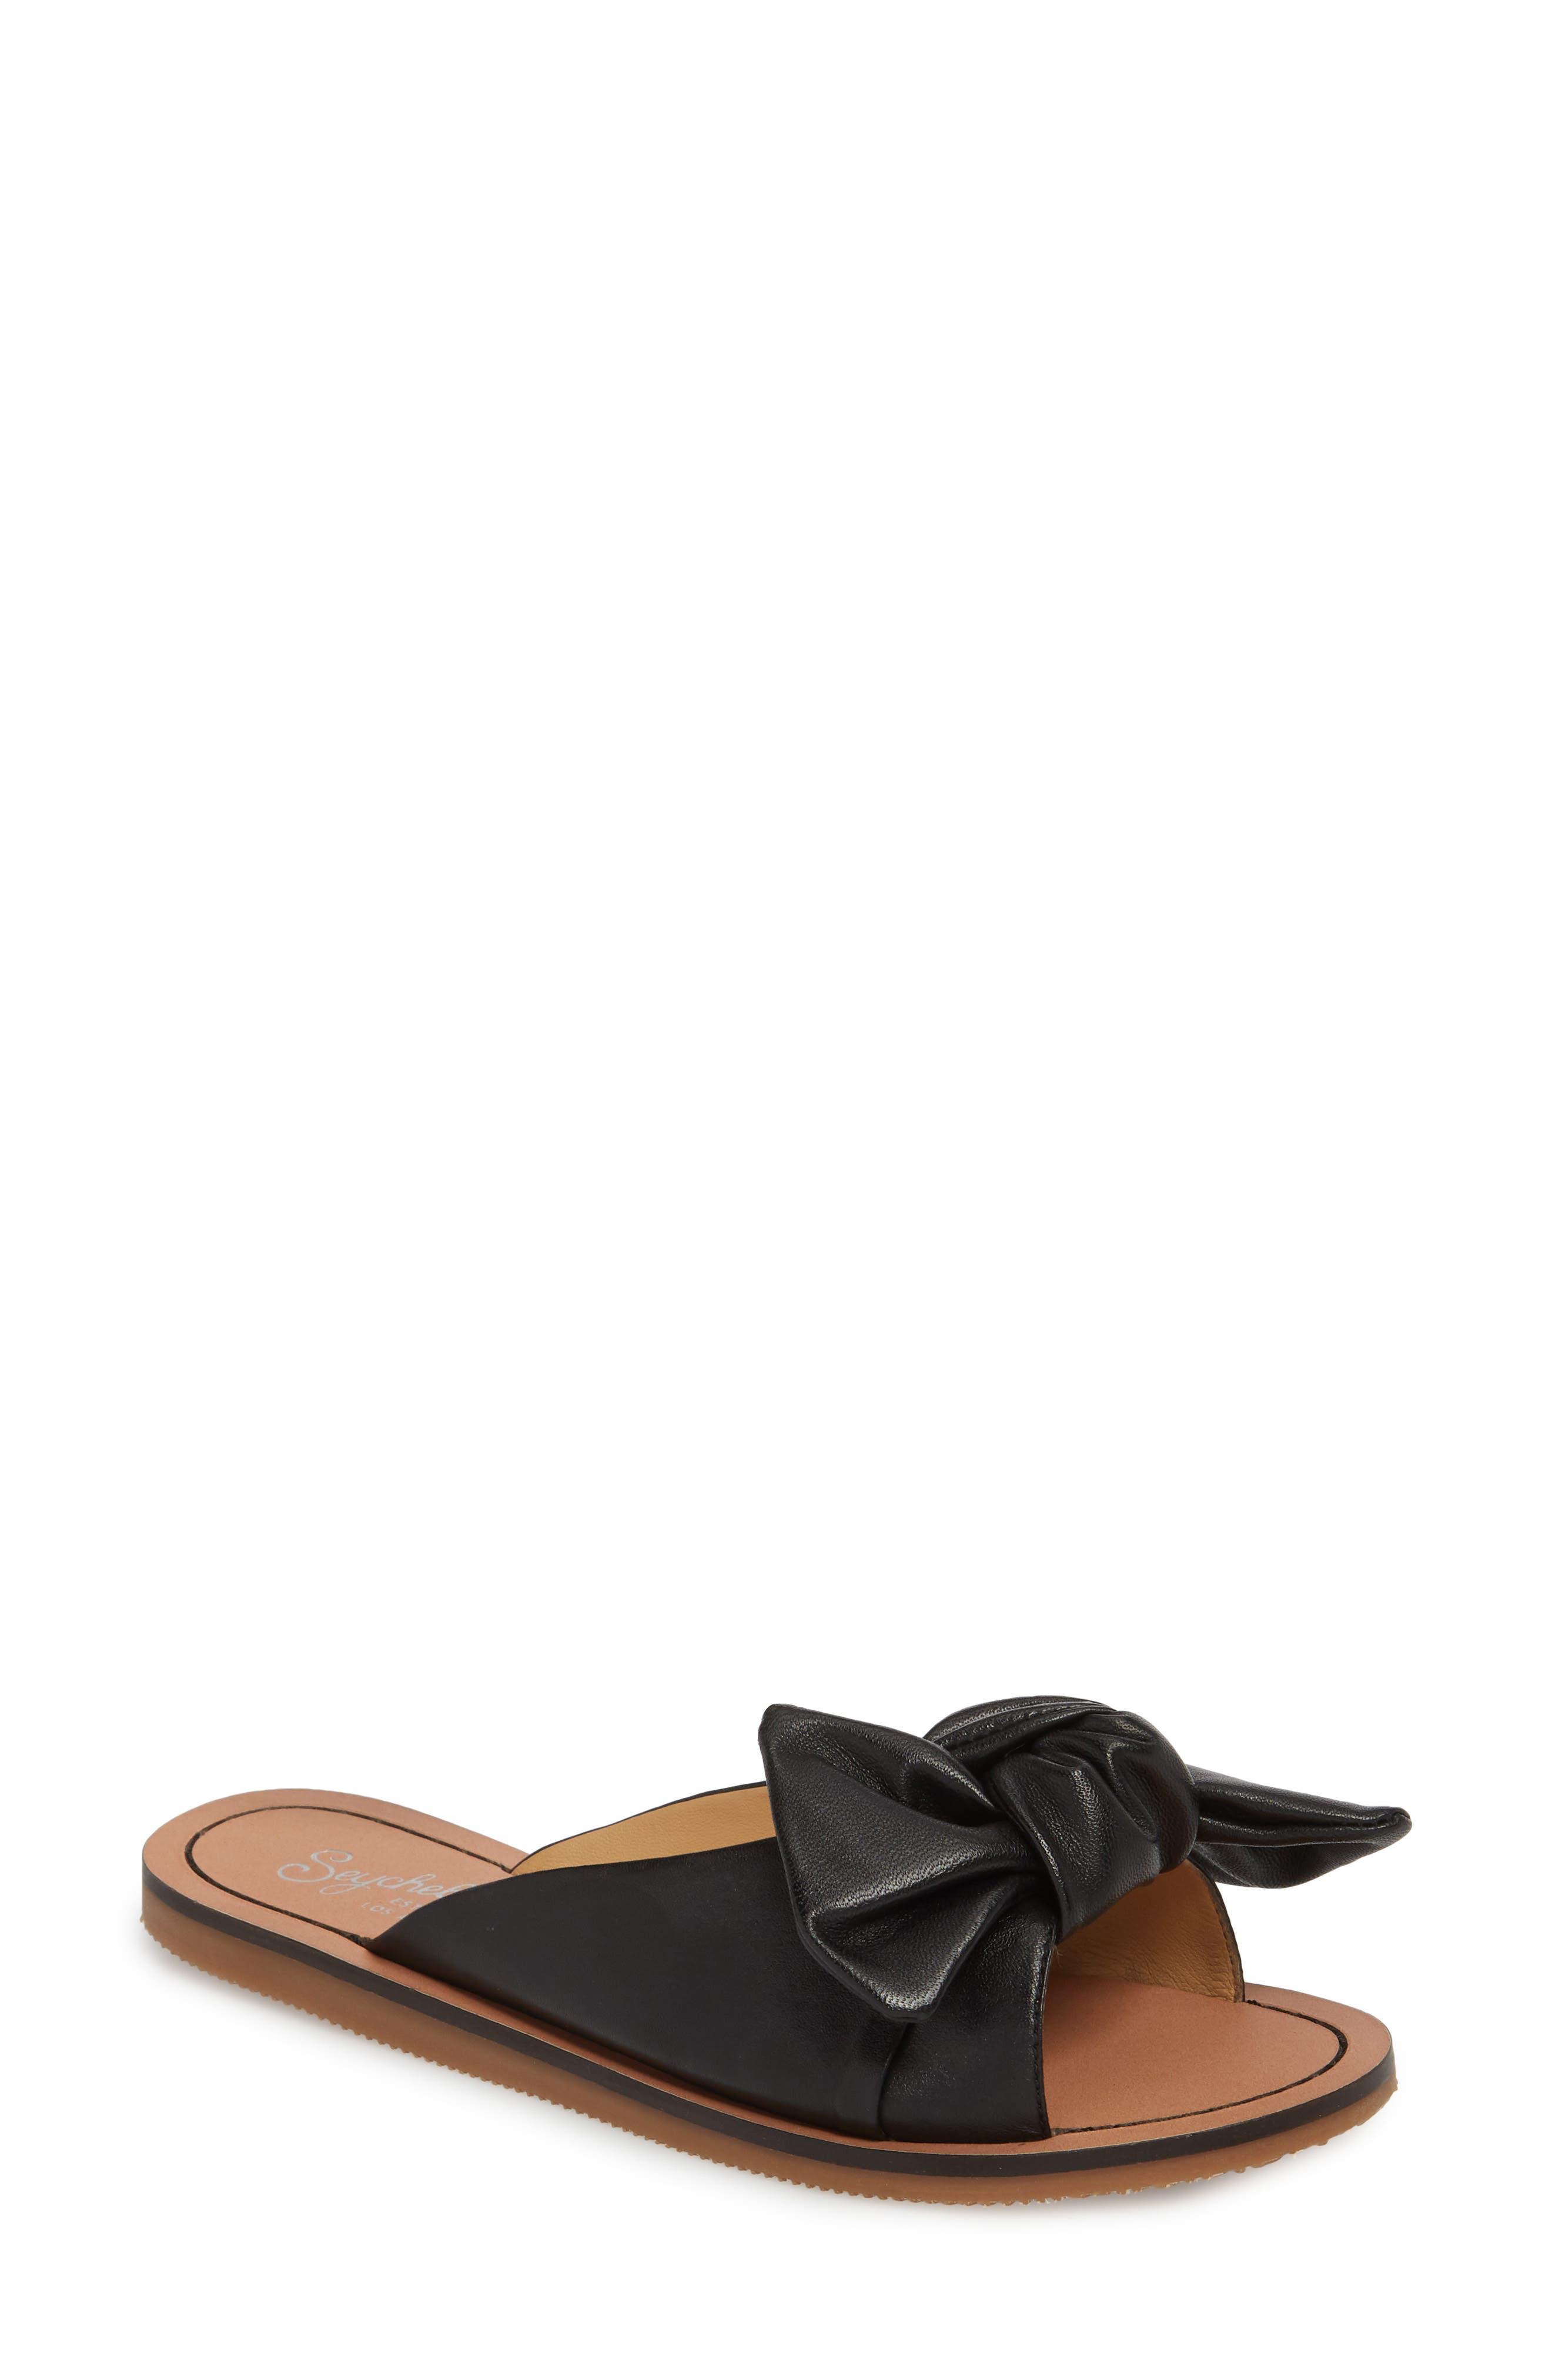 Childlike Enthusiam Slide Sandal,                         Main,                         color, BLACK LEATHER